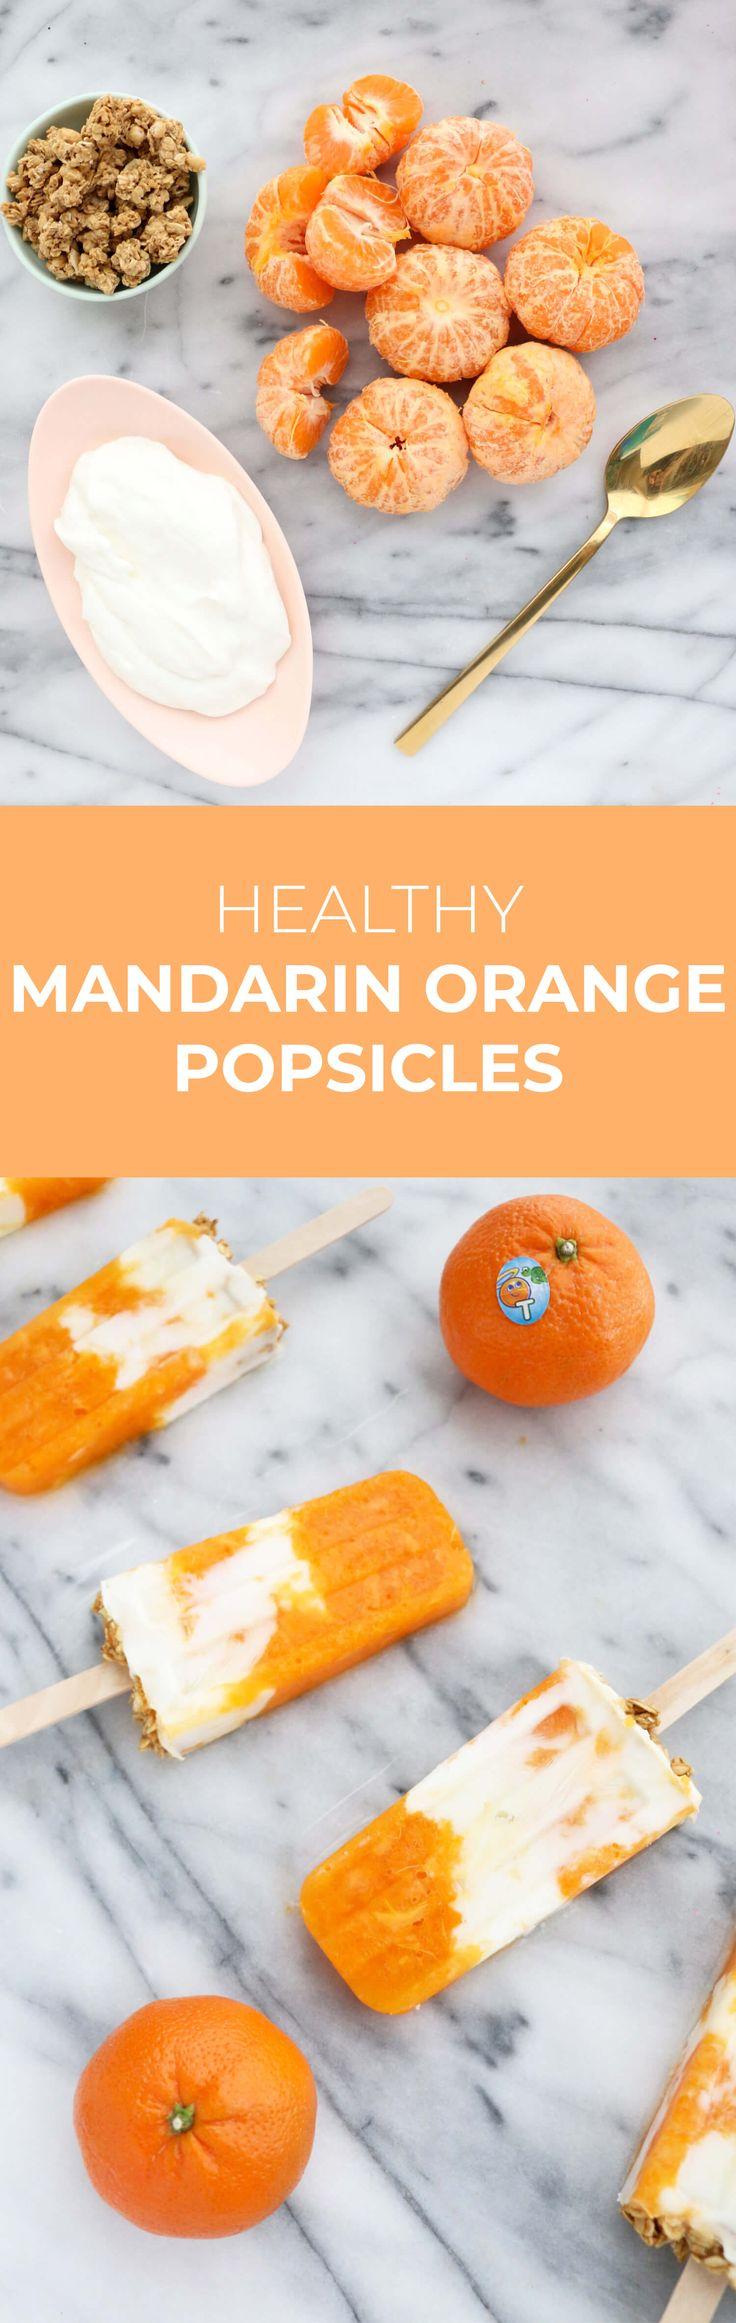 Healthy mandarin orange cream popsicle recipe